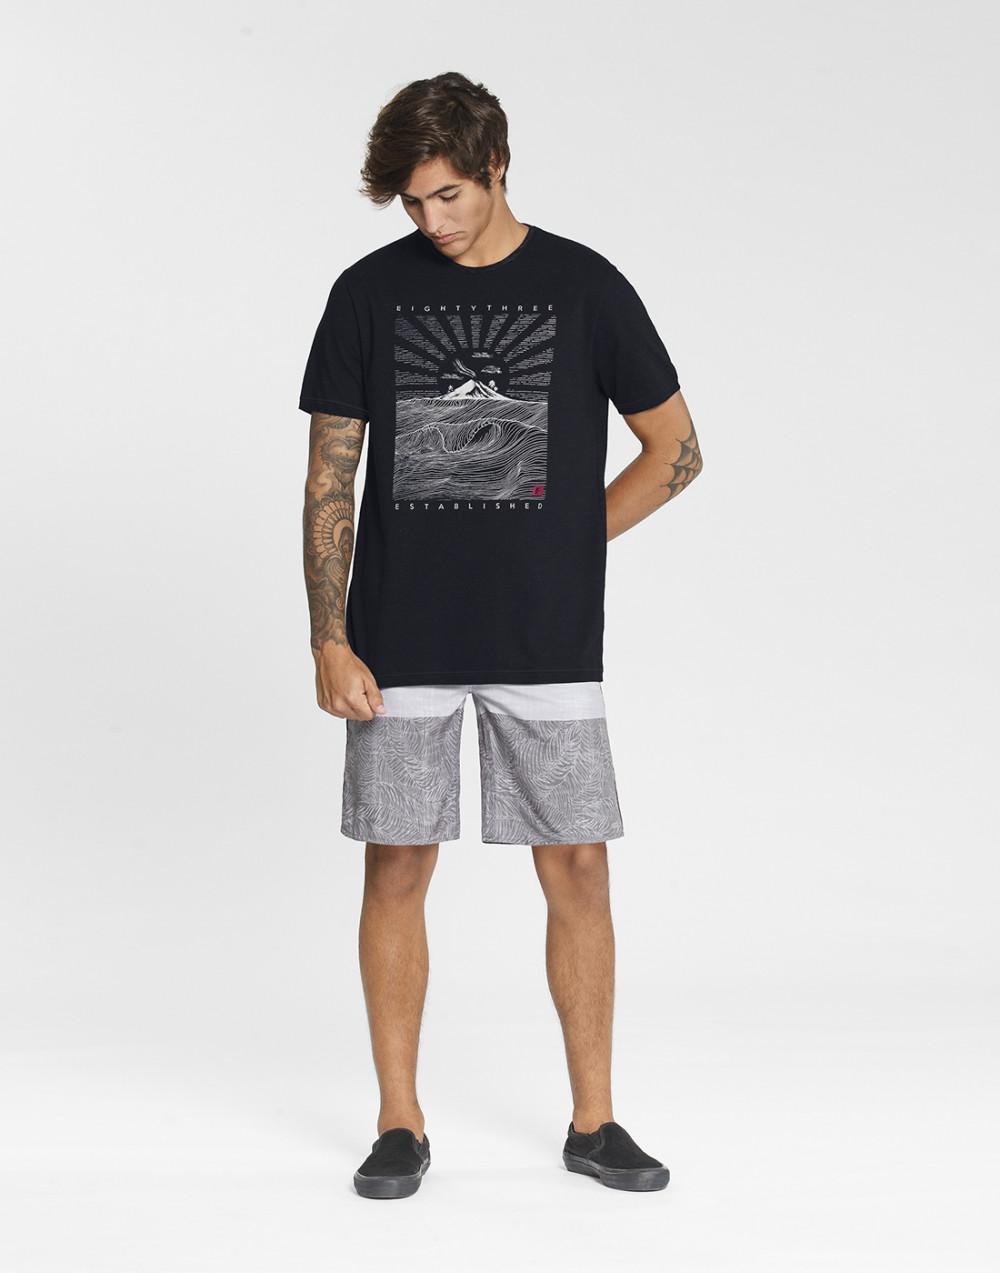 Camiseta Malha Moulinê Vanizado Estampa Preto Fico